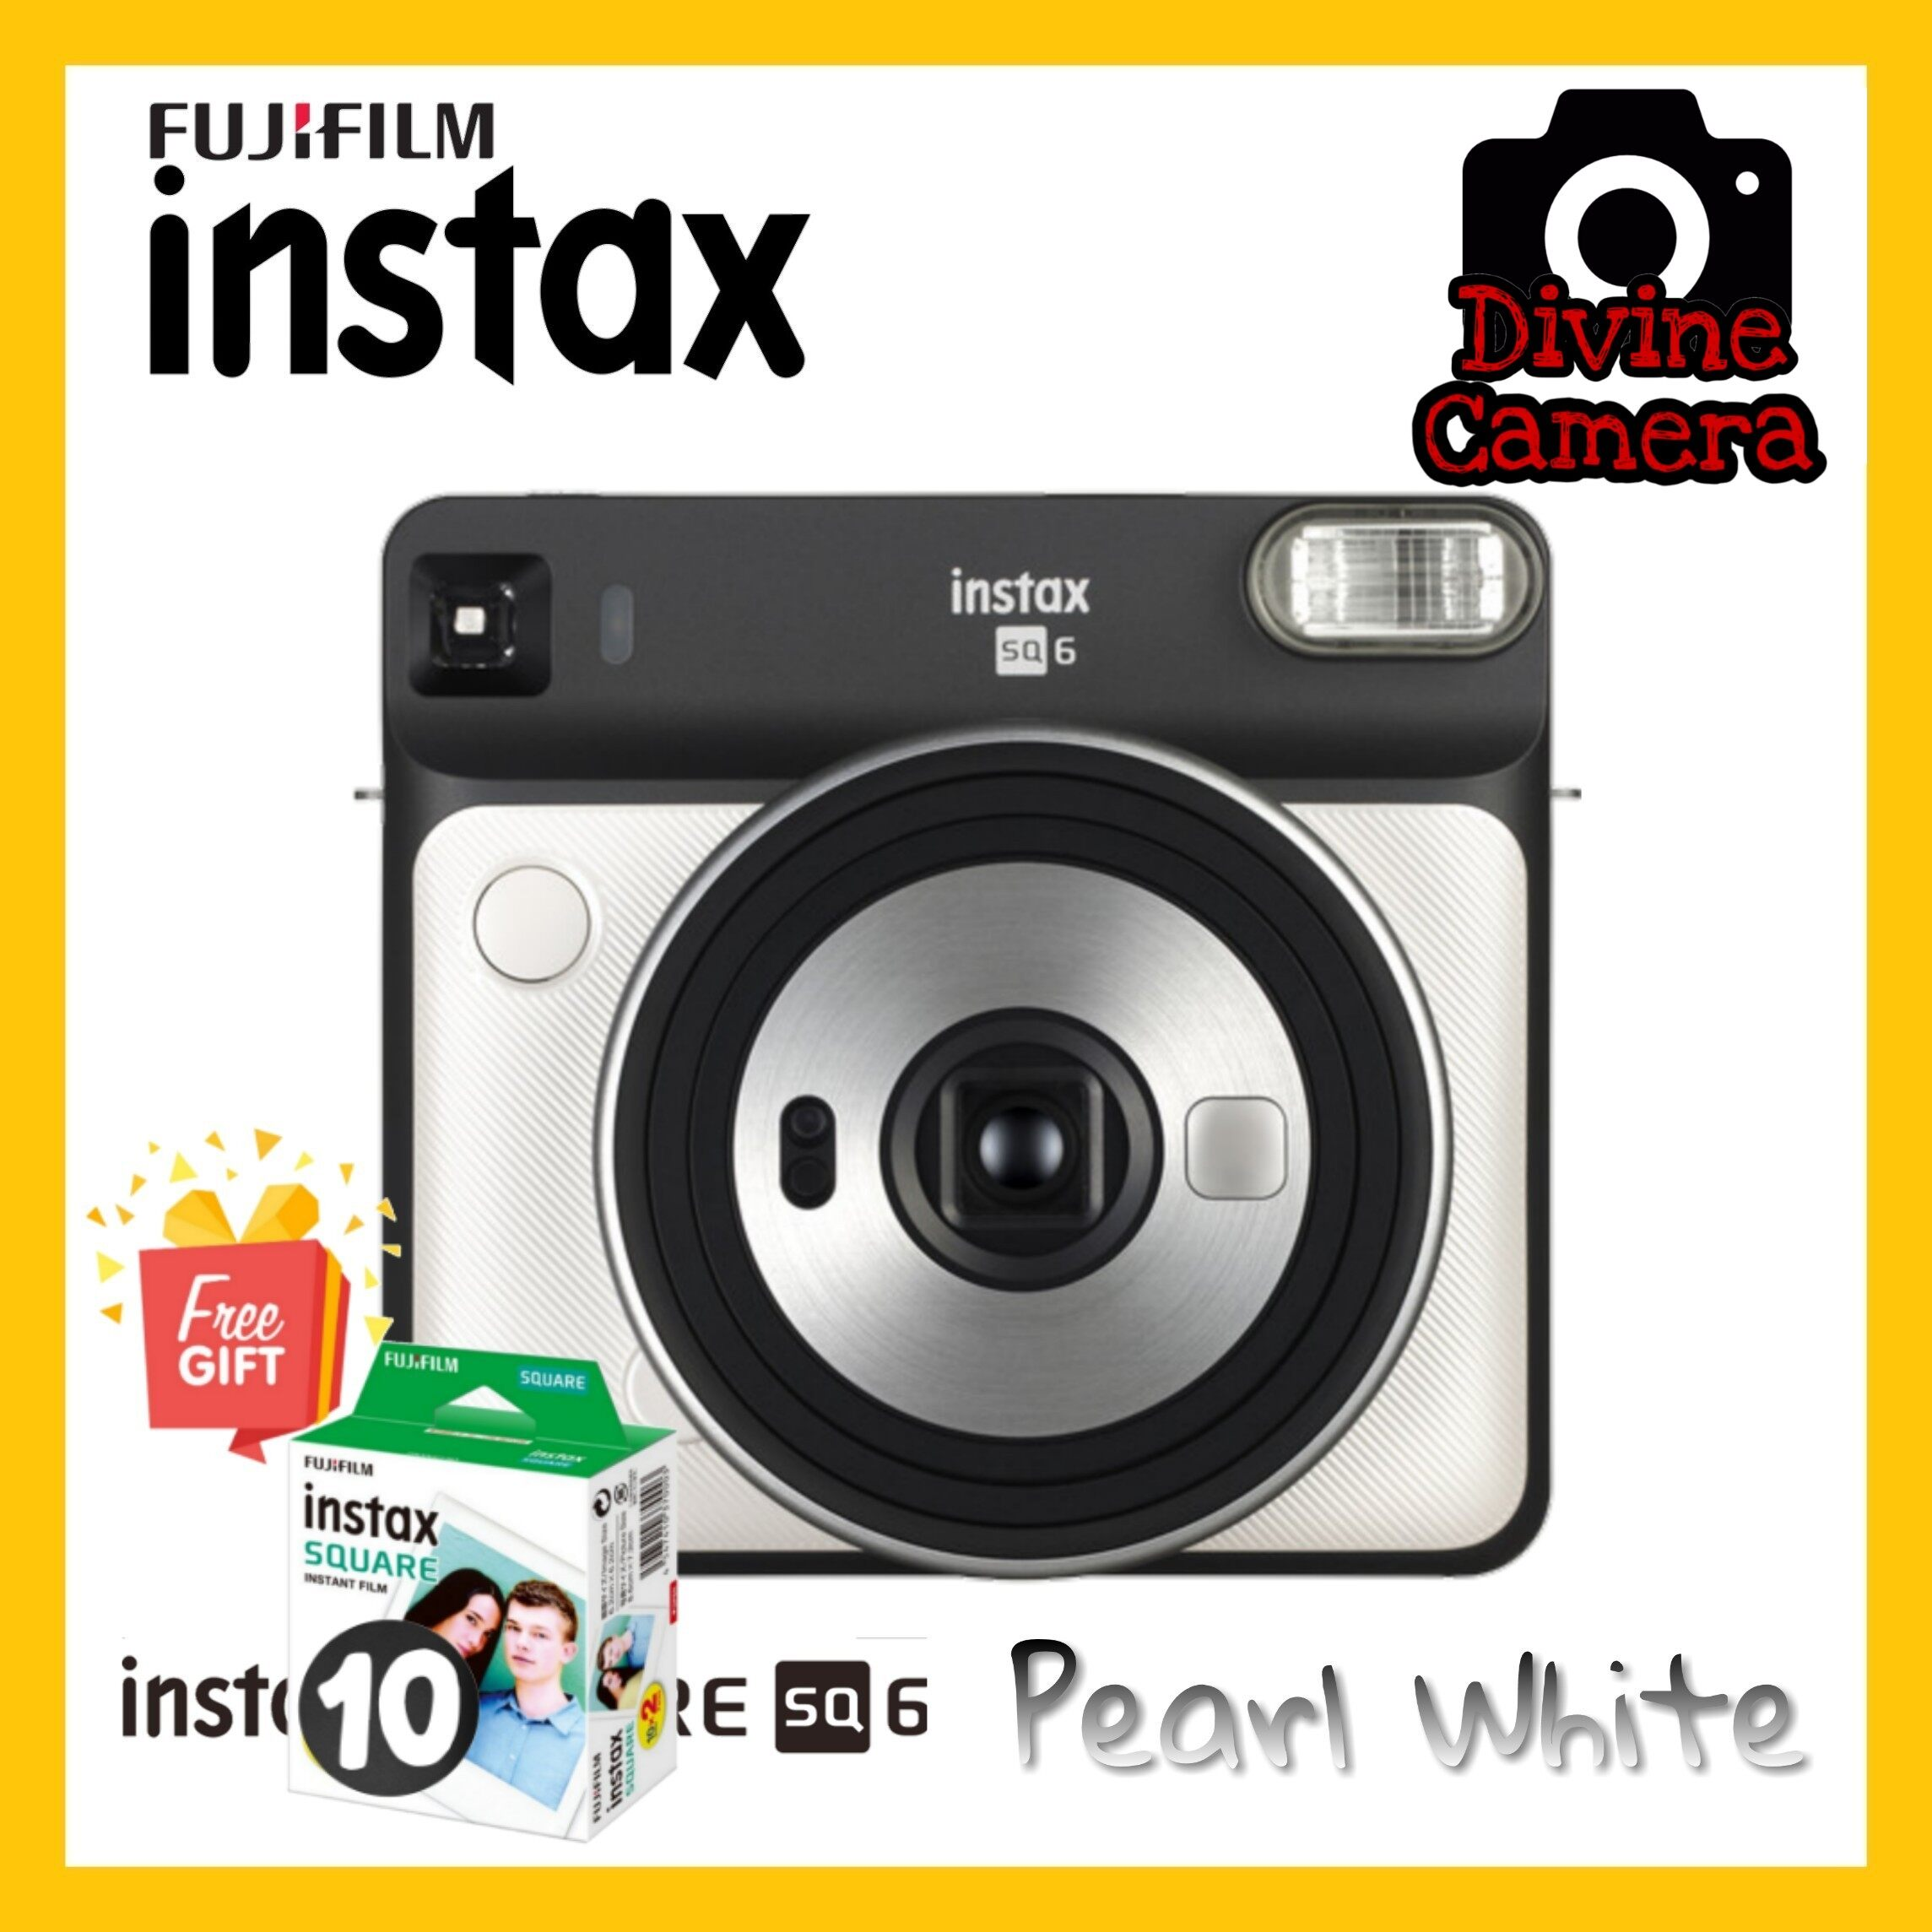 FUJIFILM INSTAX SQUARE SQ6 Instant Film Camera Special Package